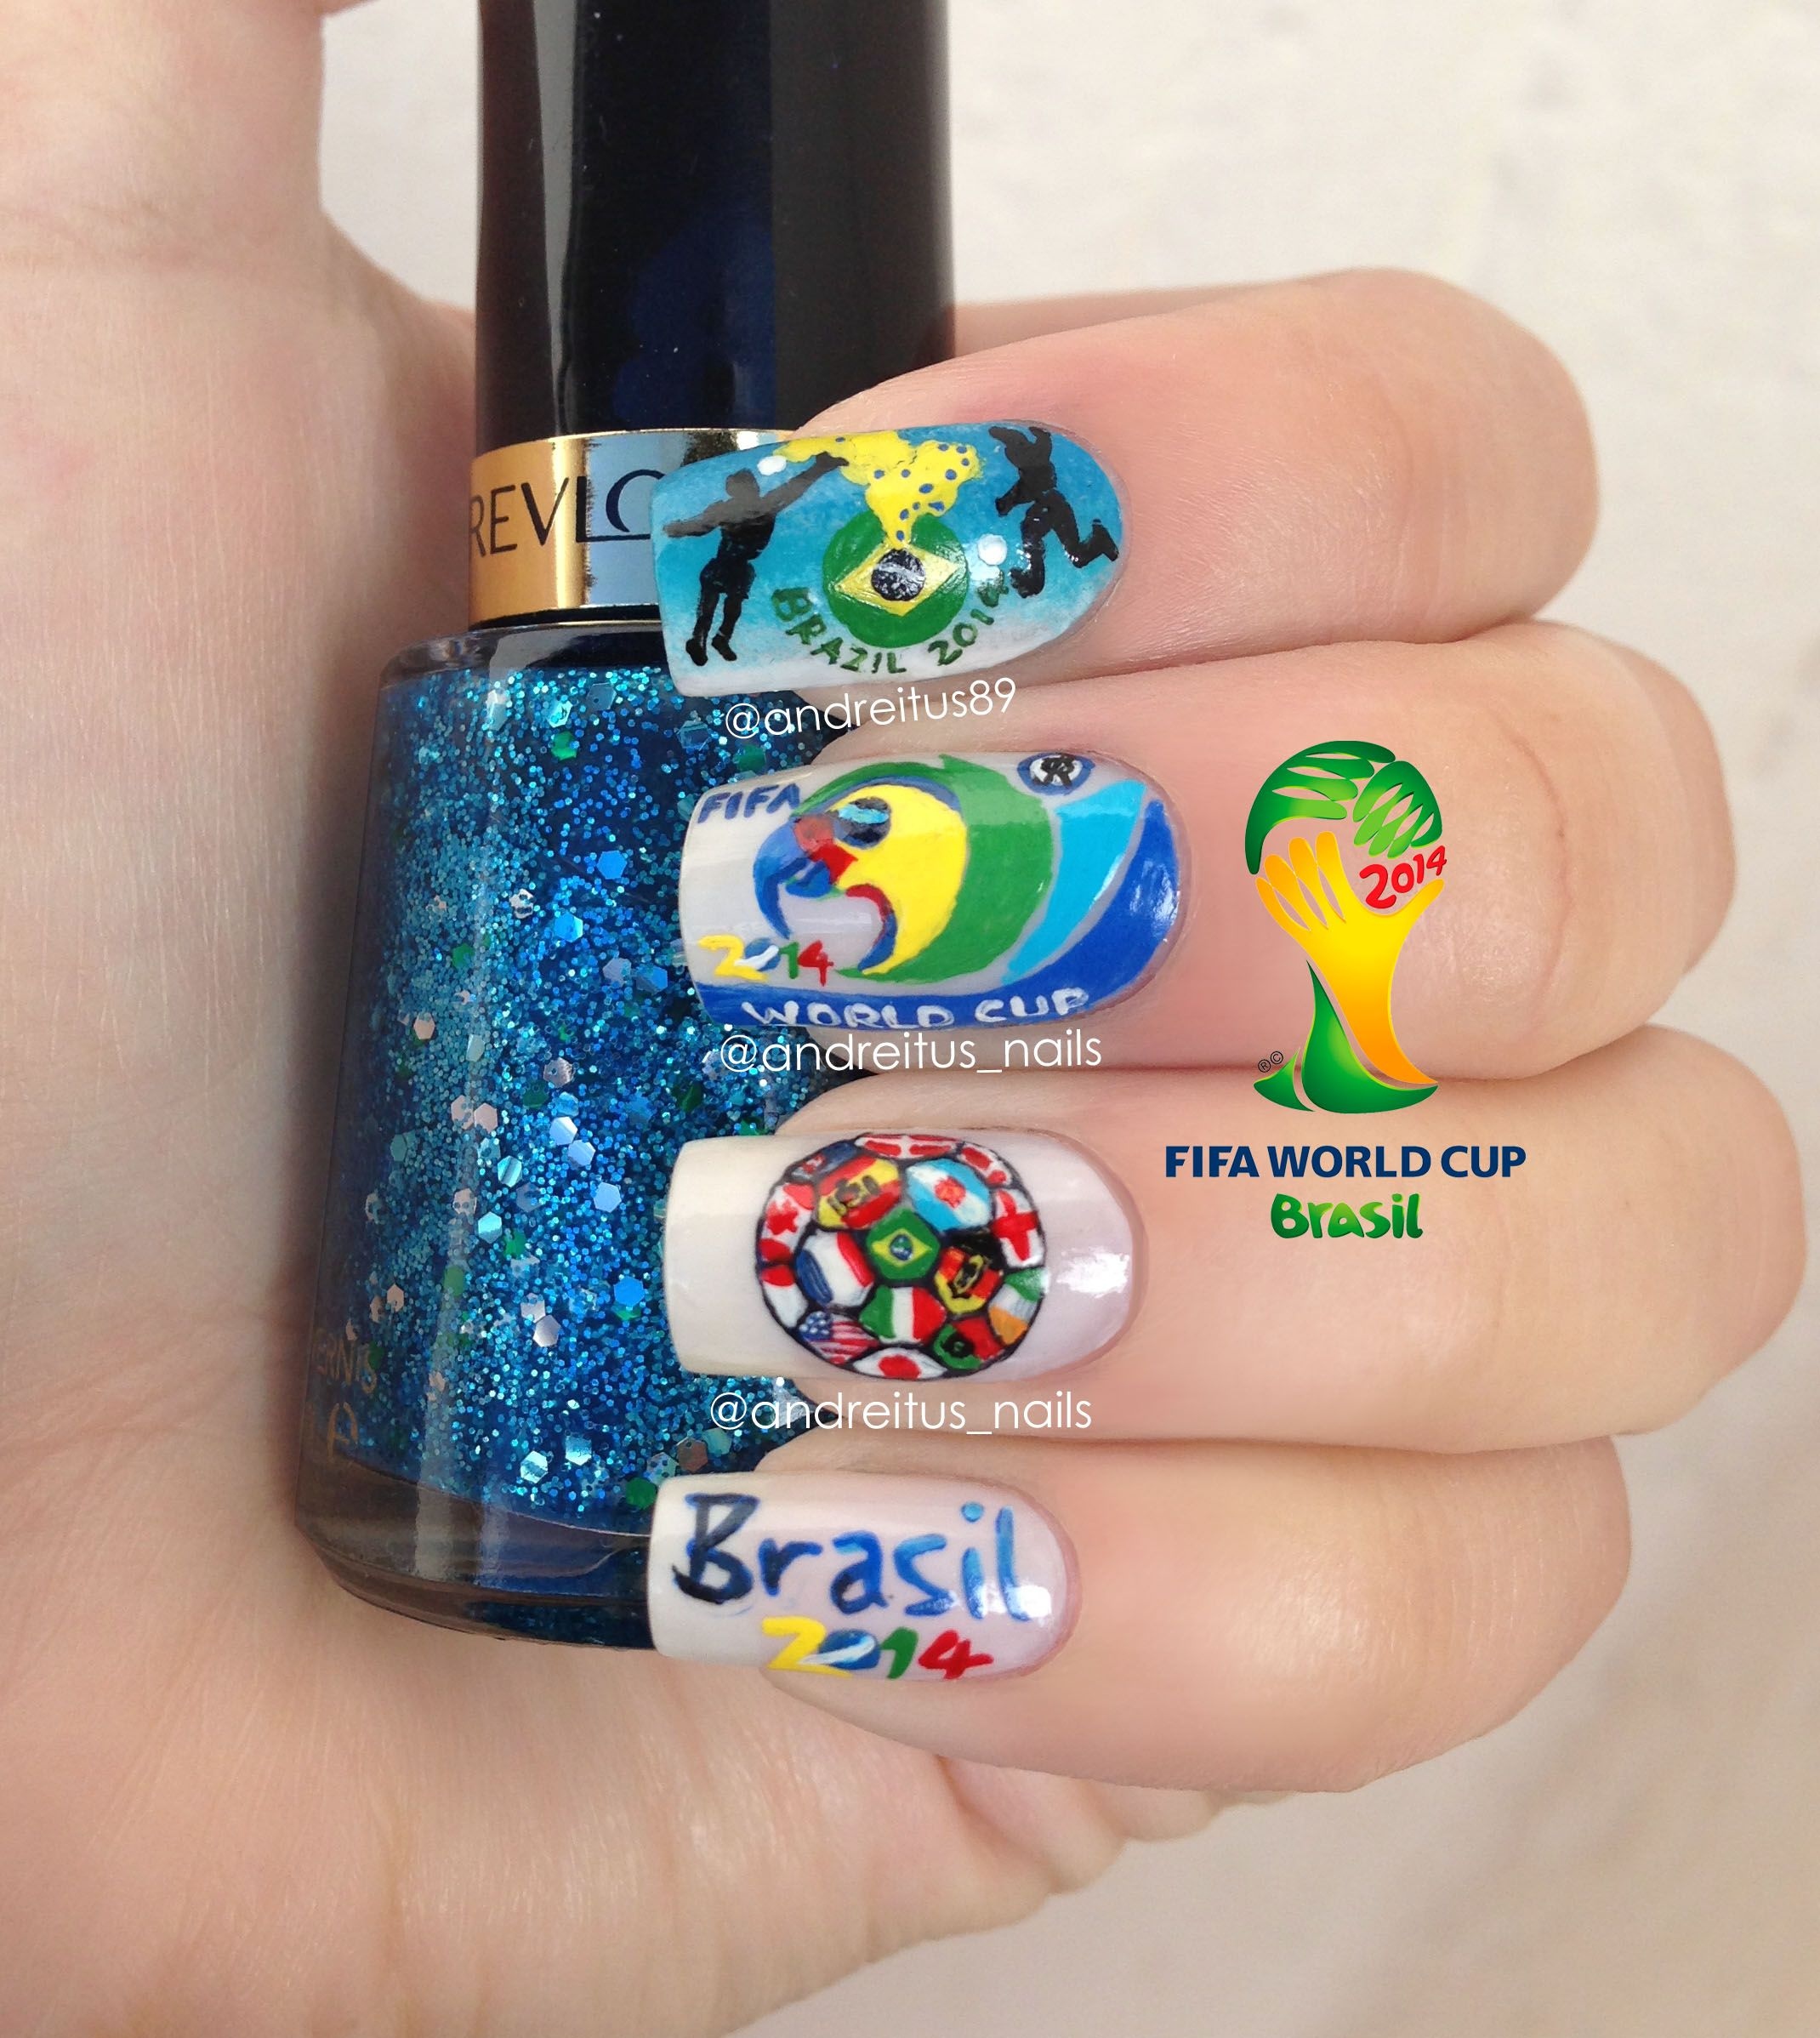 brasil 2014 fifa world cup nails